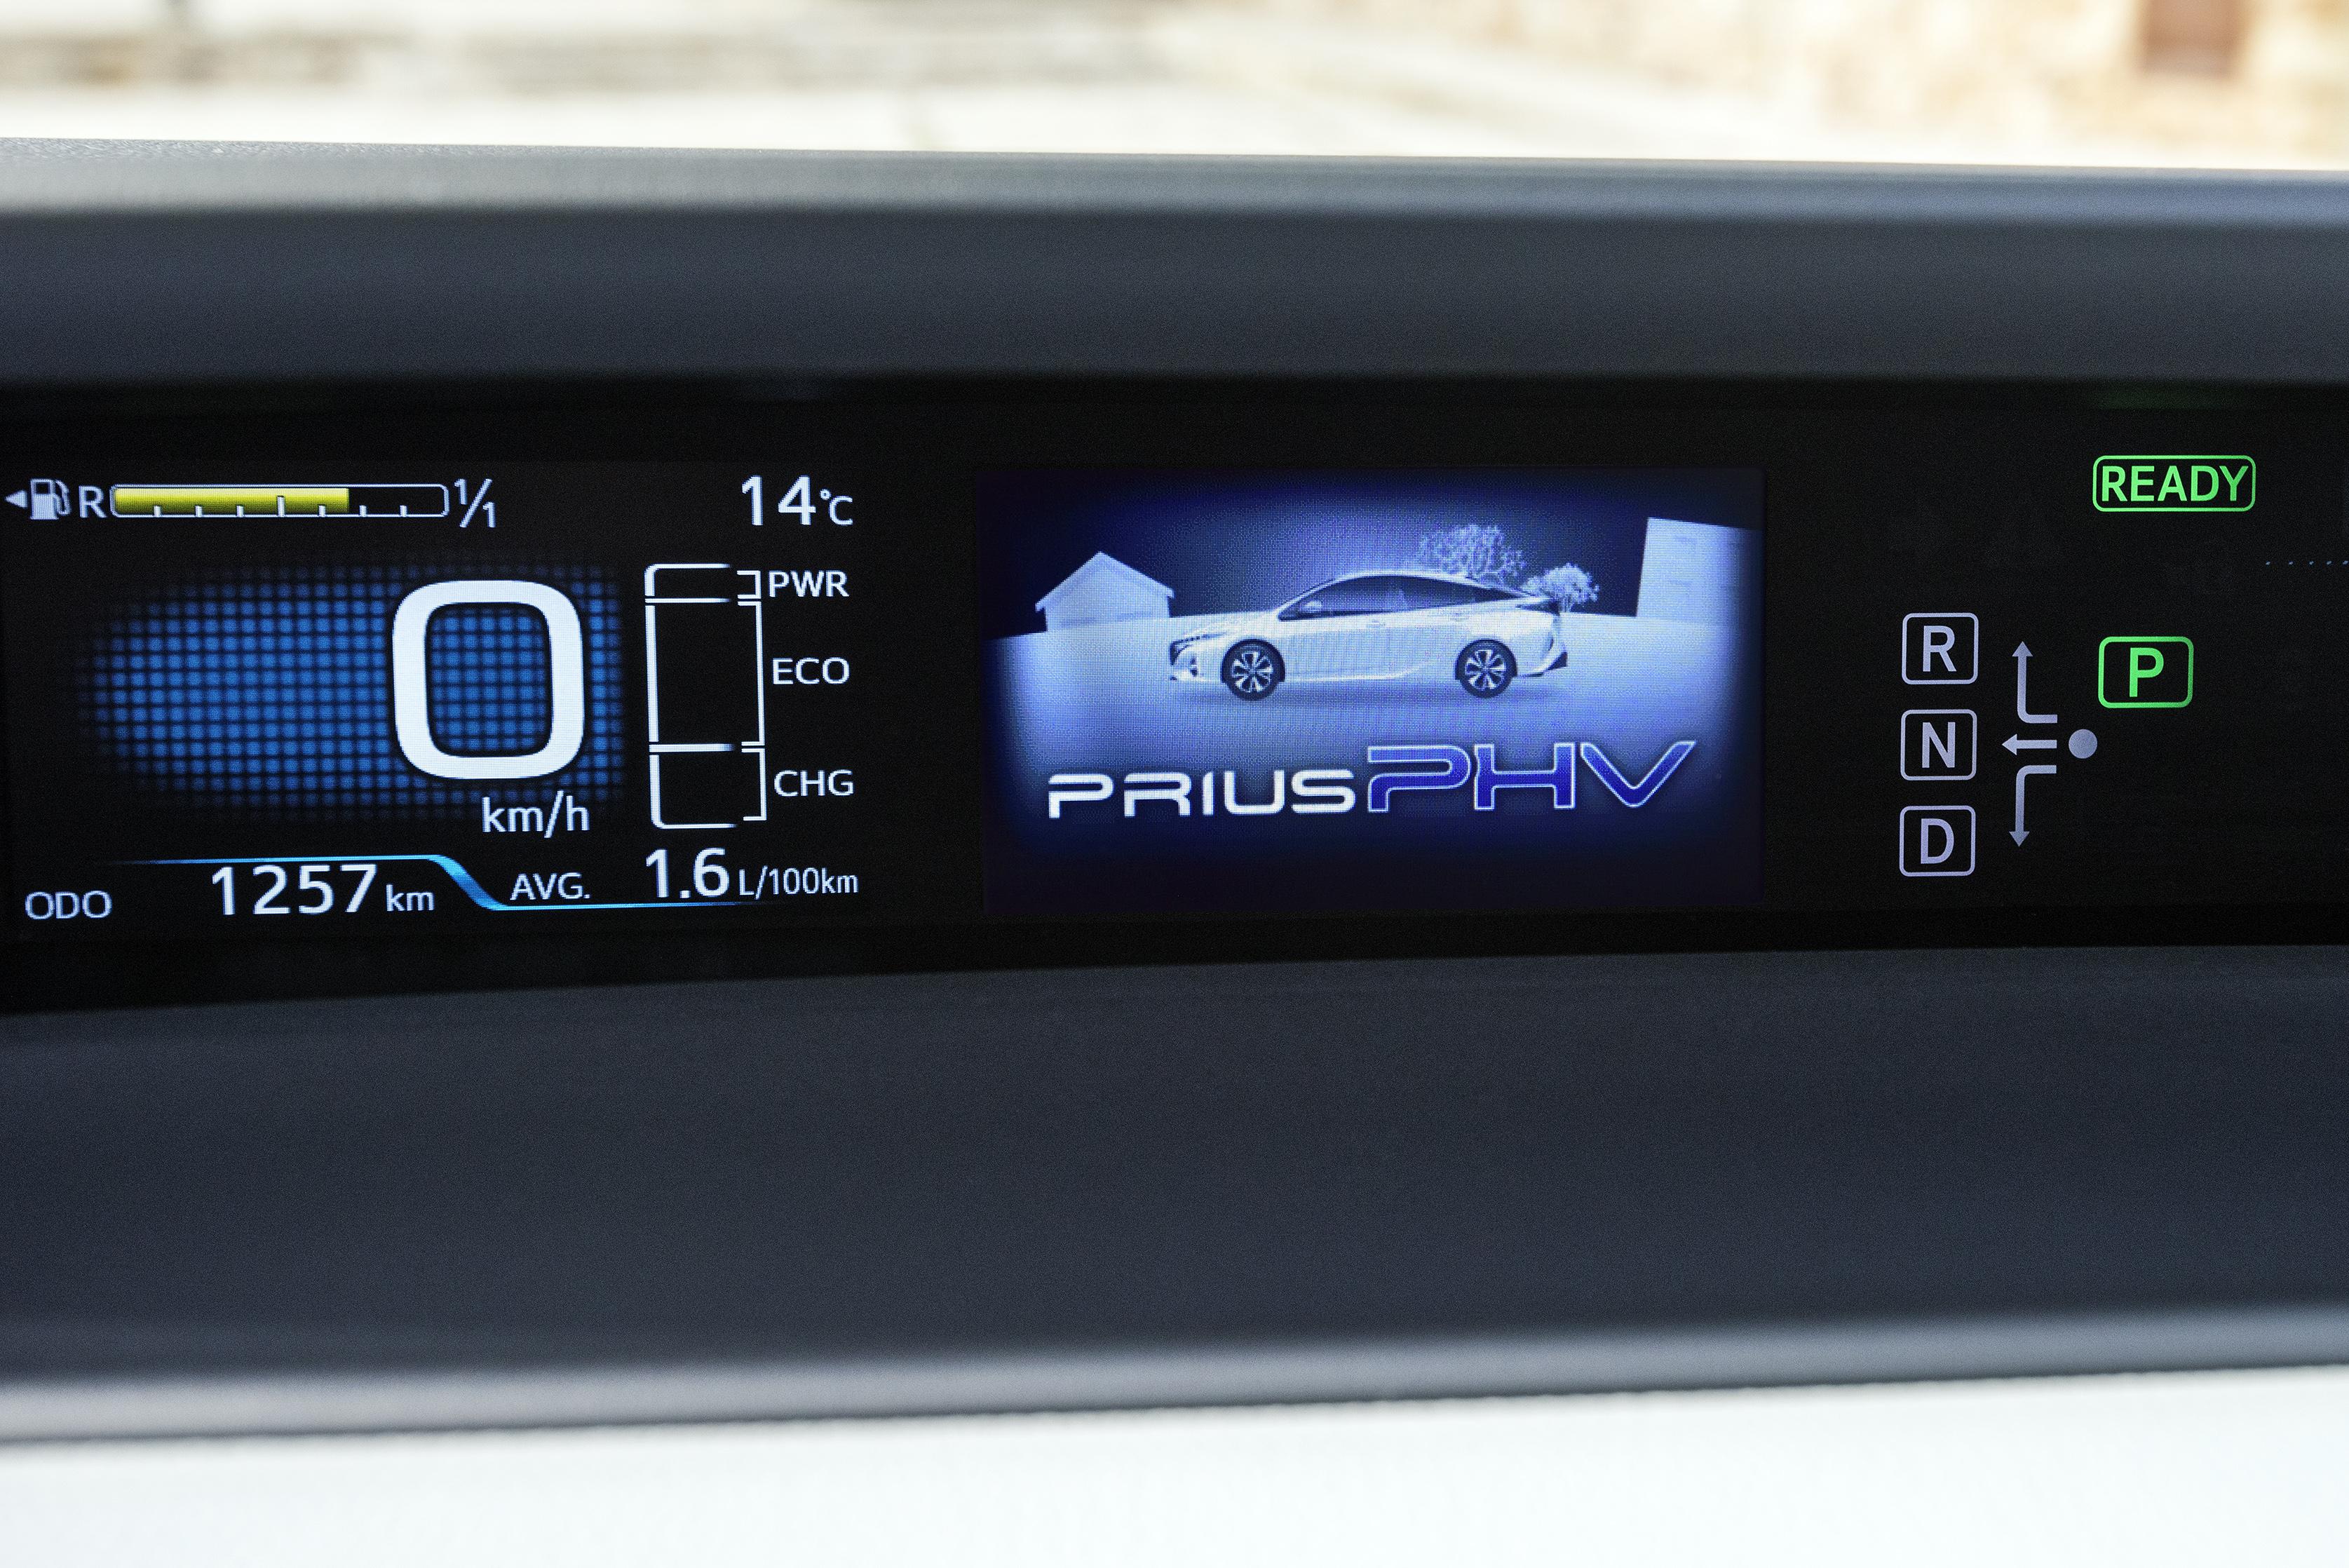 New Toyota Prius Plug-in Hybrid – double the EV range Image 612750